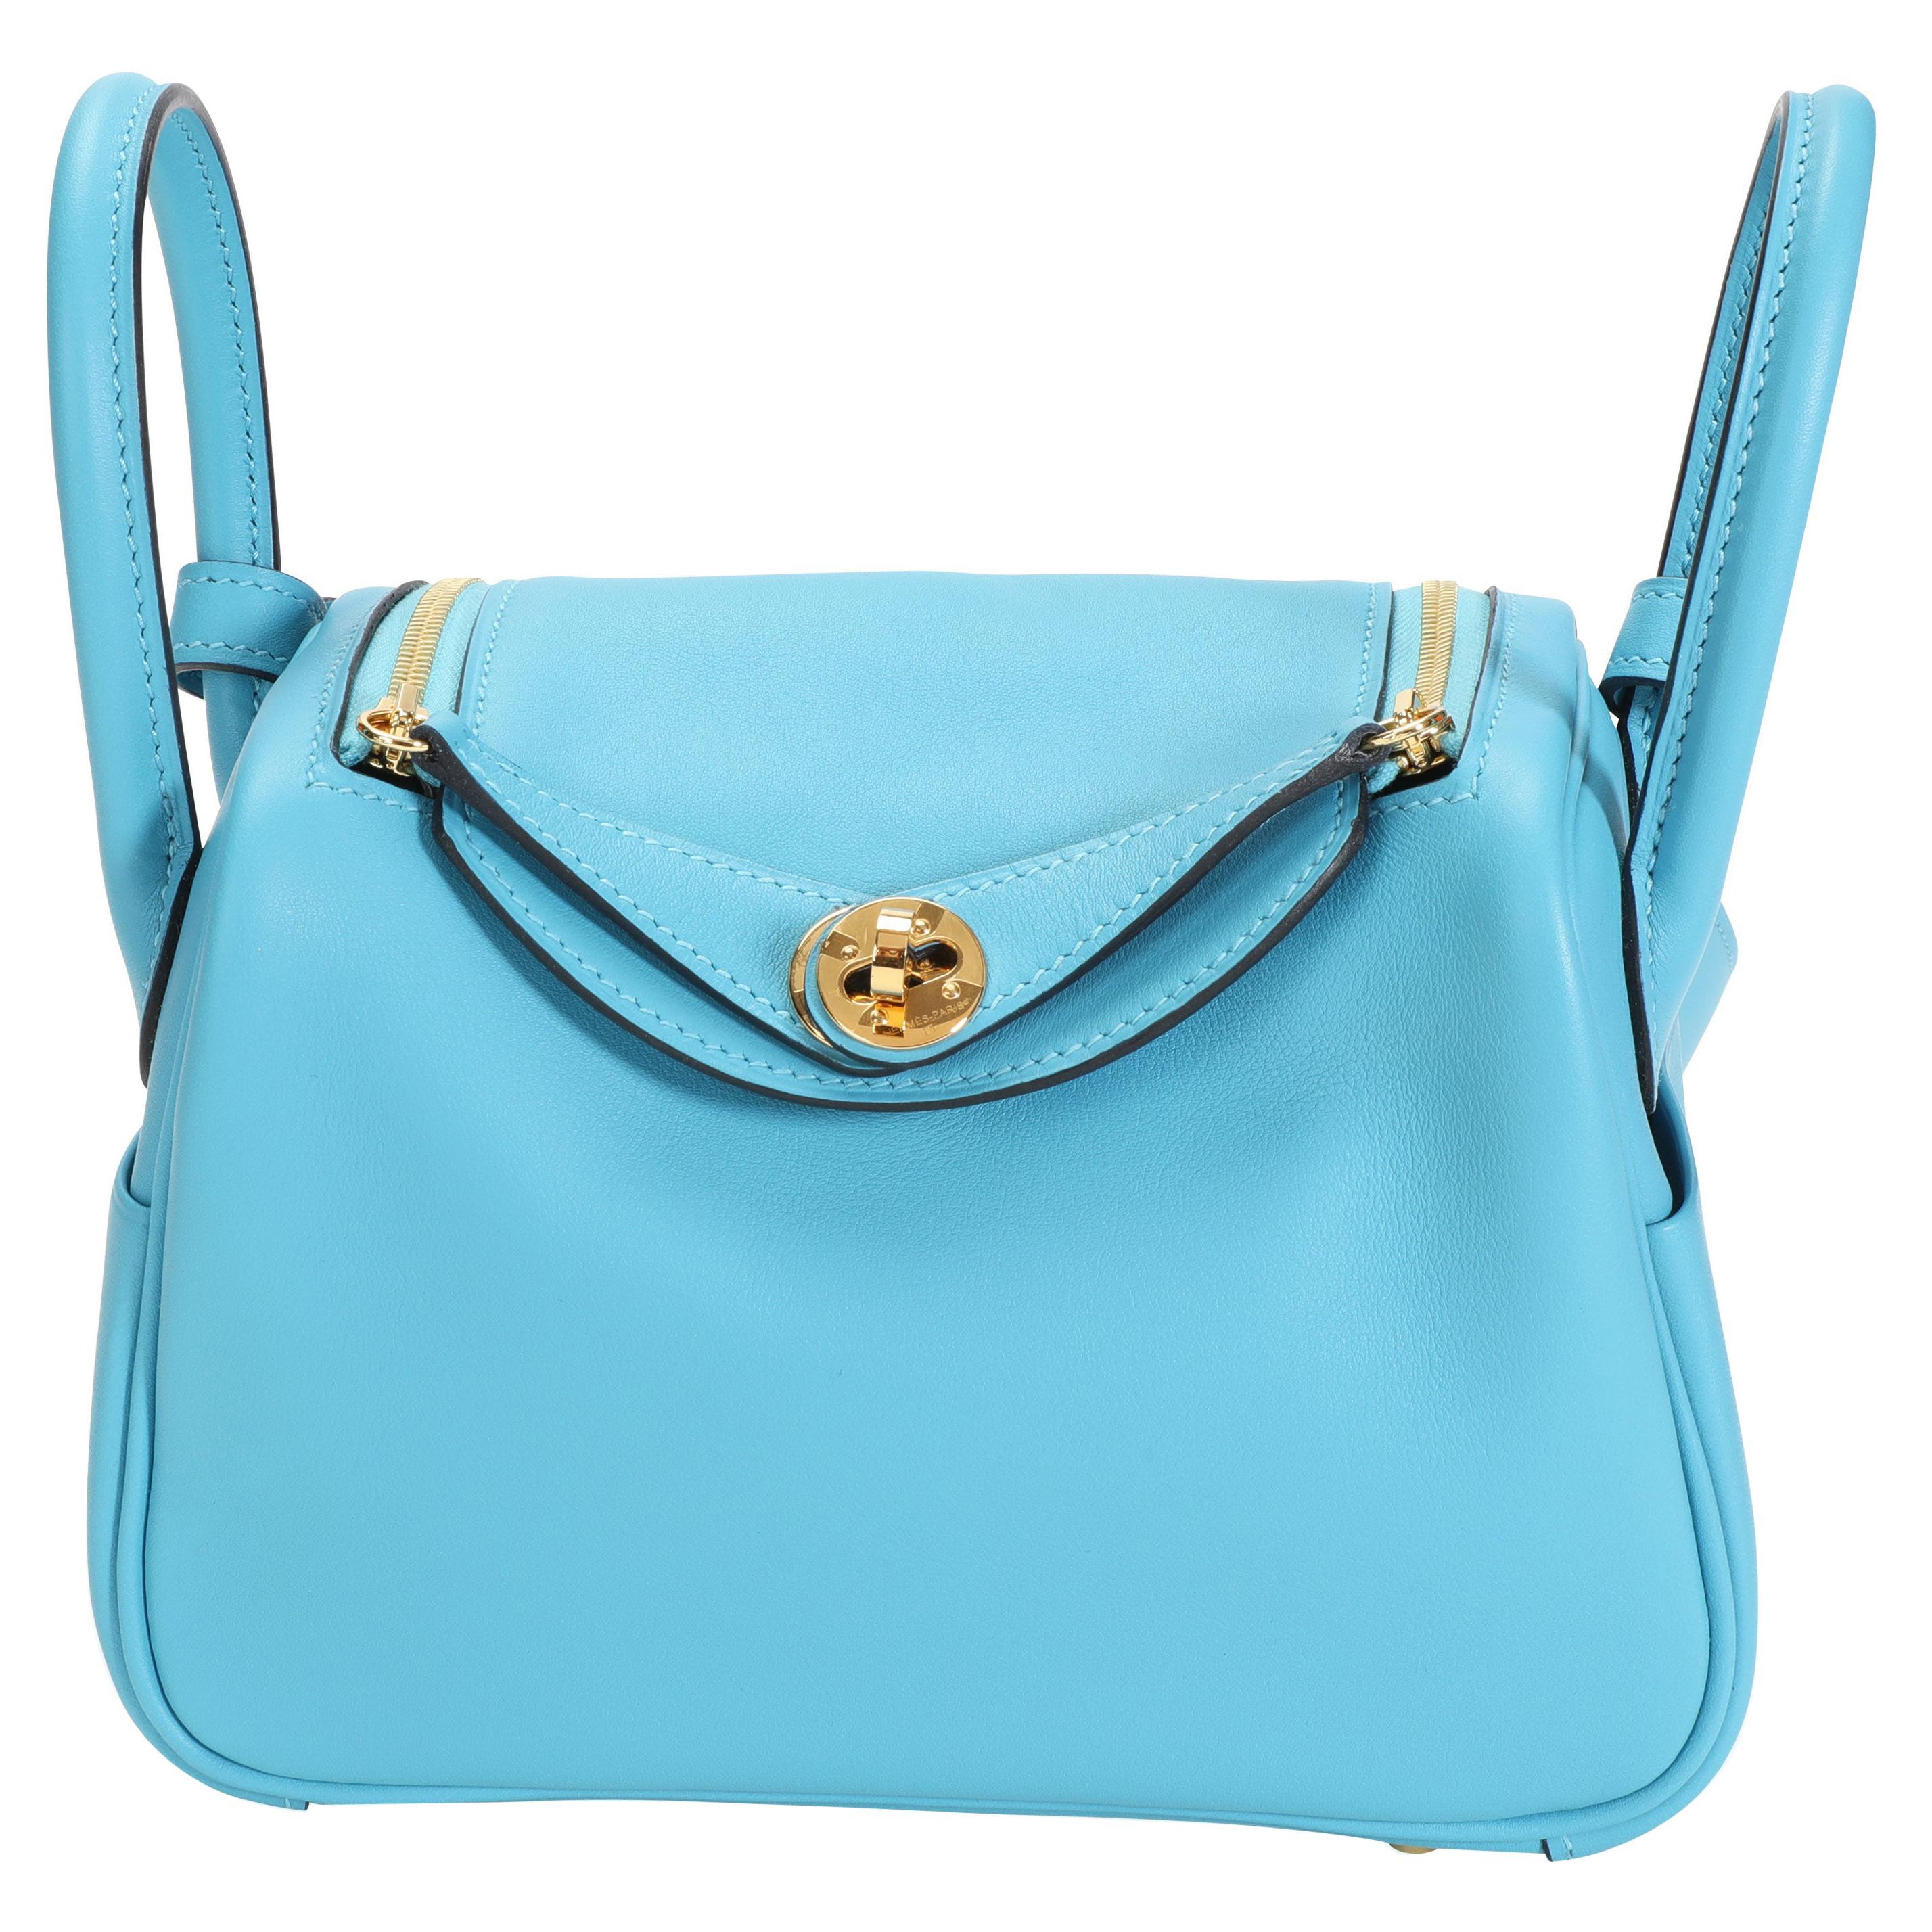 Hermès Bleu Du Nord Swift Mini Lindy GHW